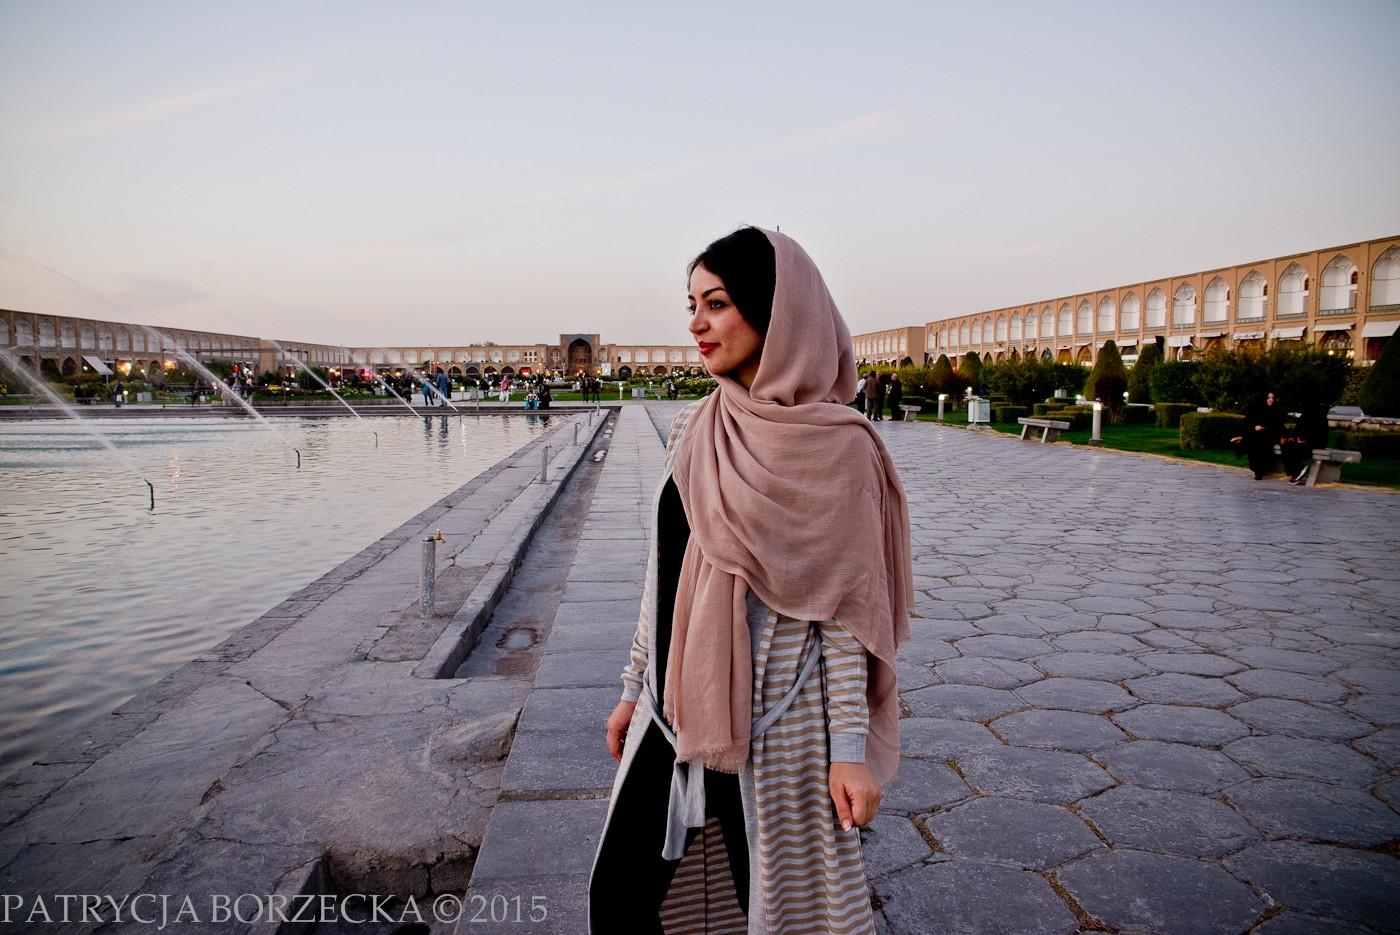 PatrycjaBorzecka-photography-Iran-people09